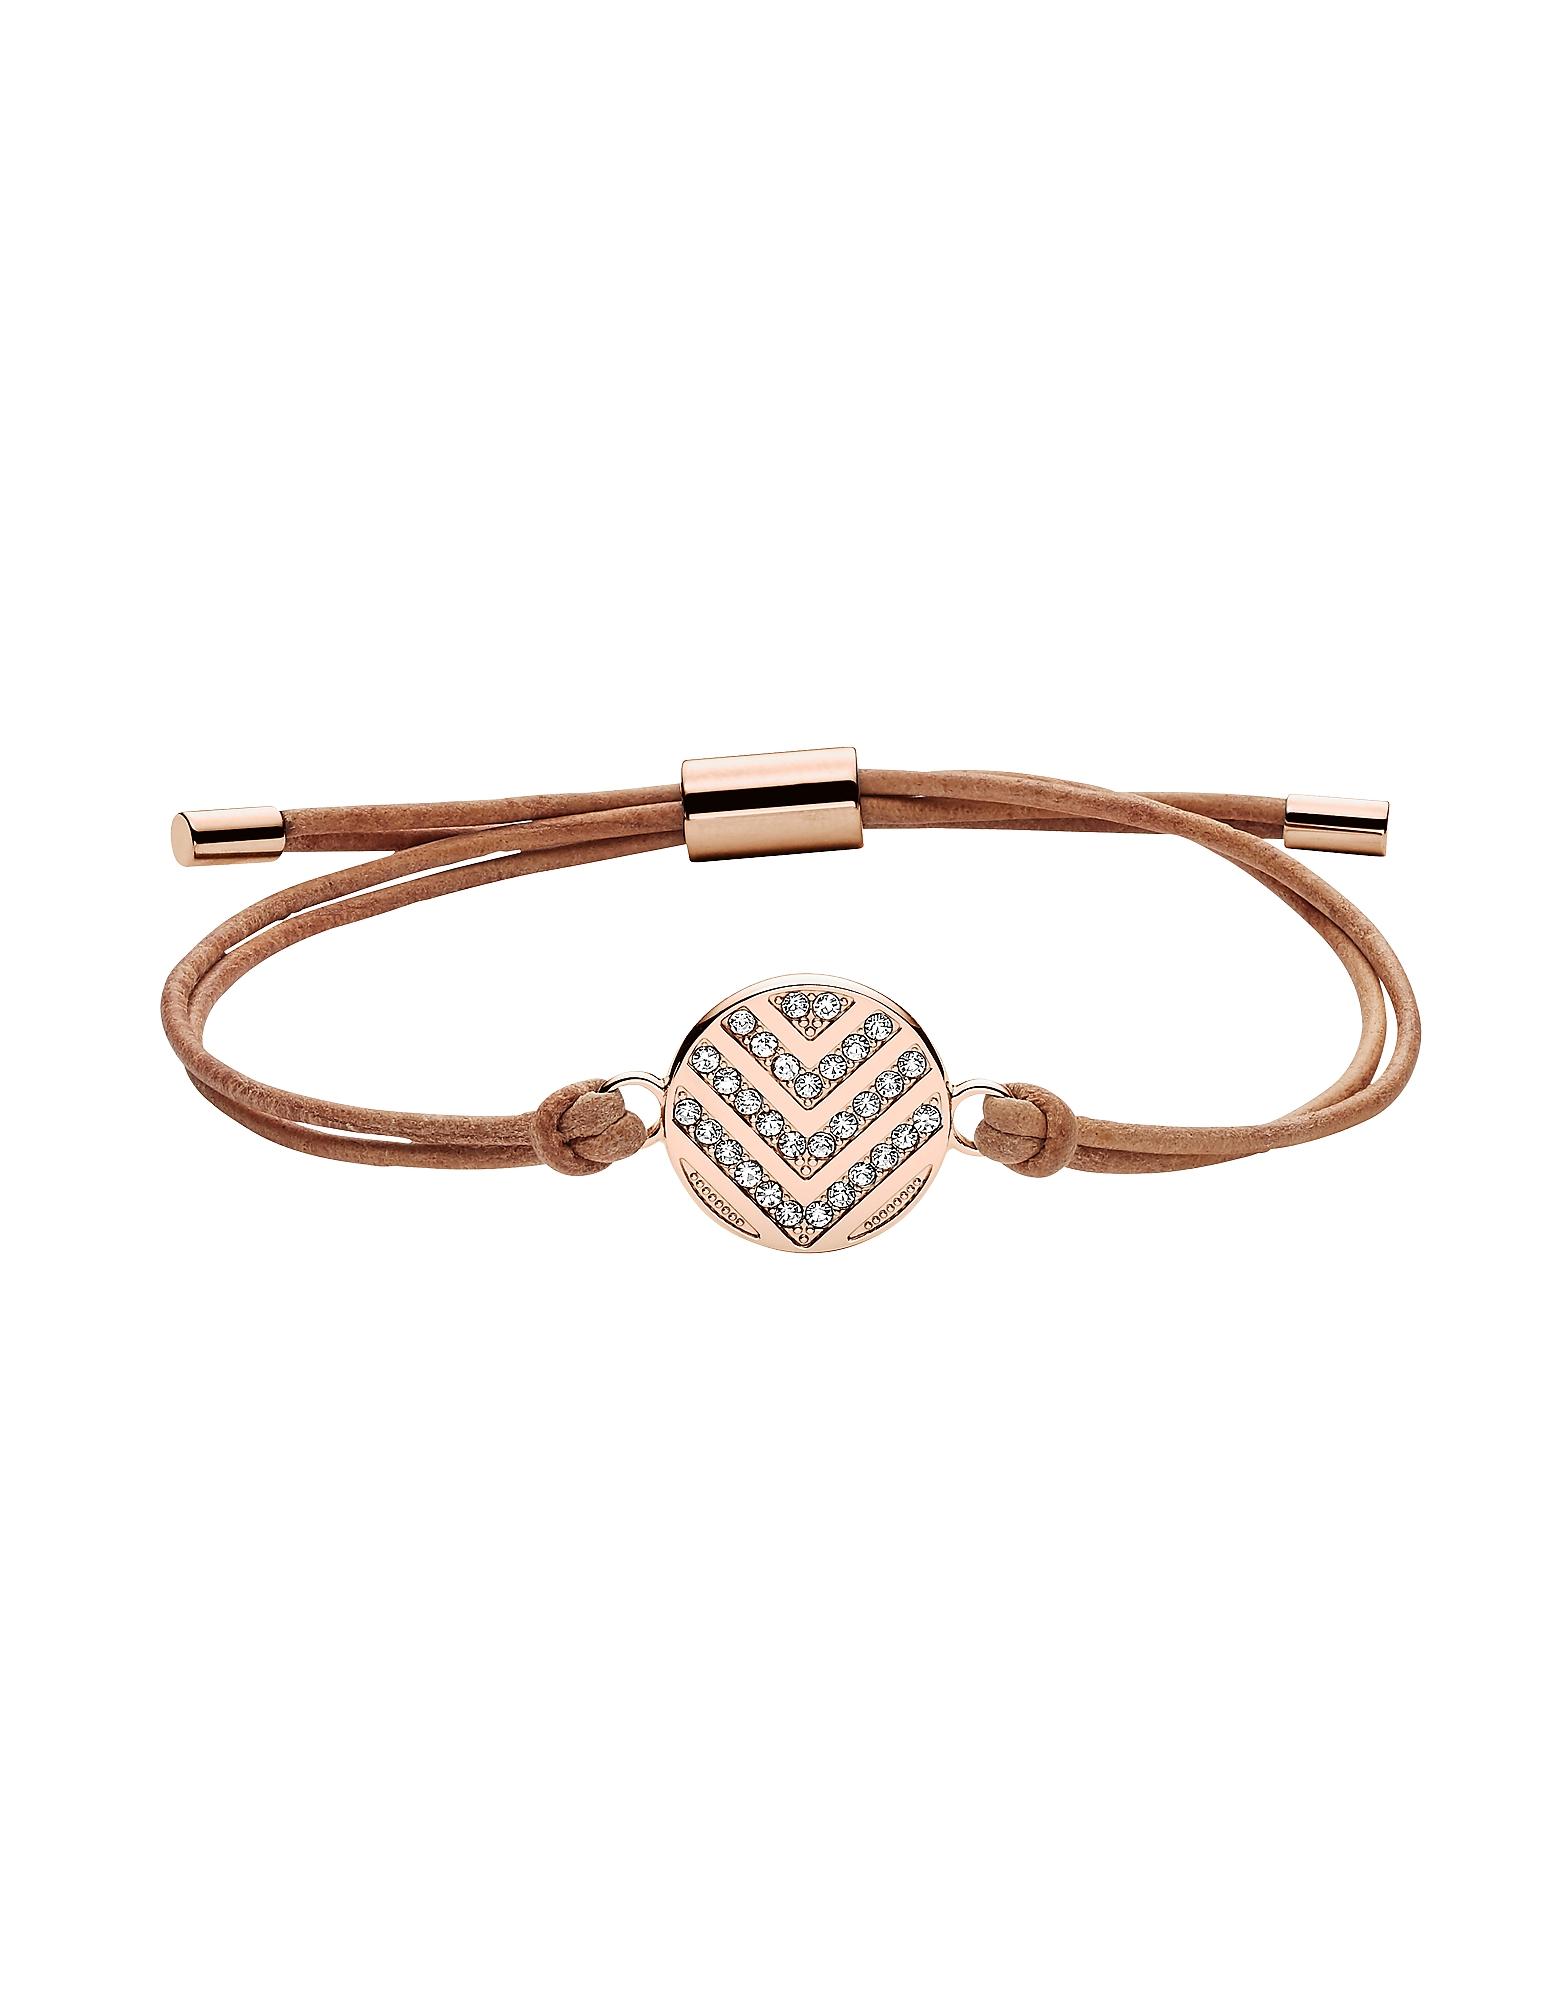 Fossil Bracelets, Women's Chevron Glitz Bracelet